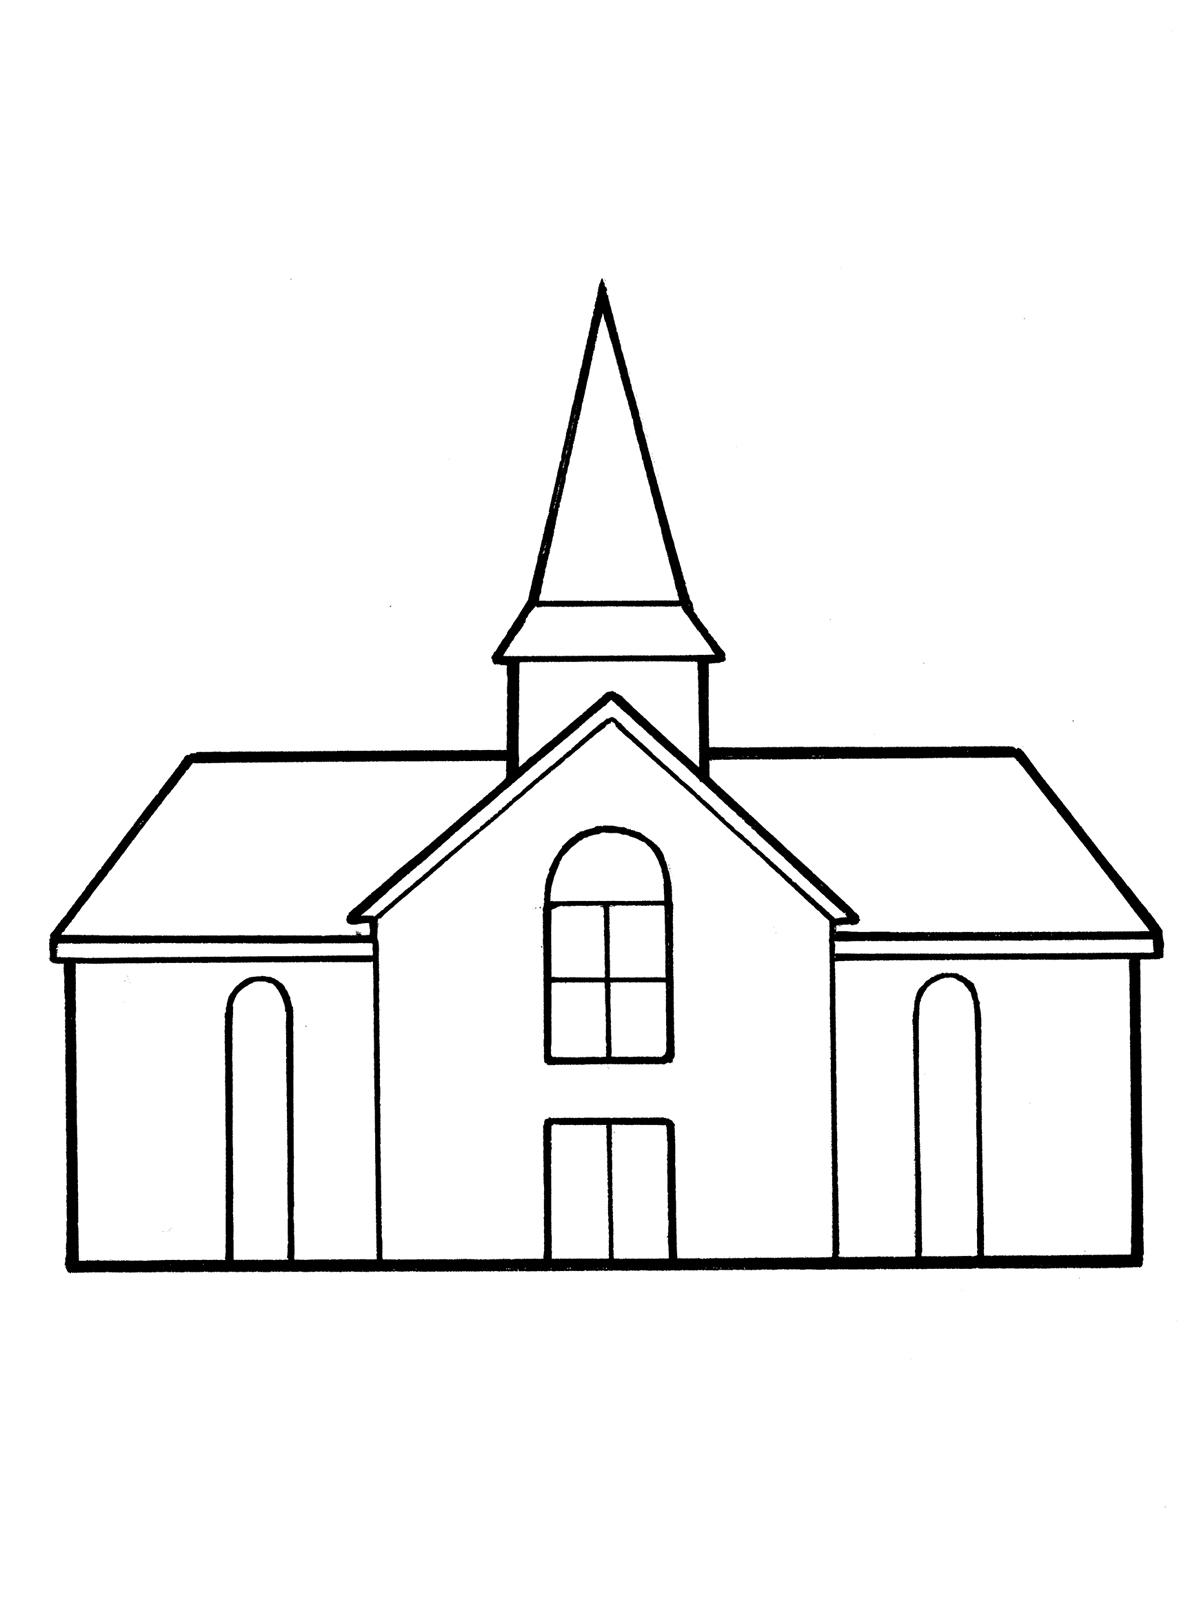 Church clipart black and white, Picture #355719 church.